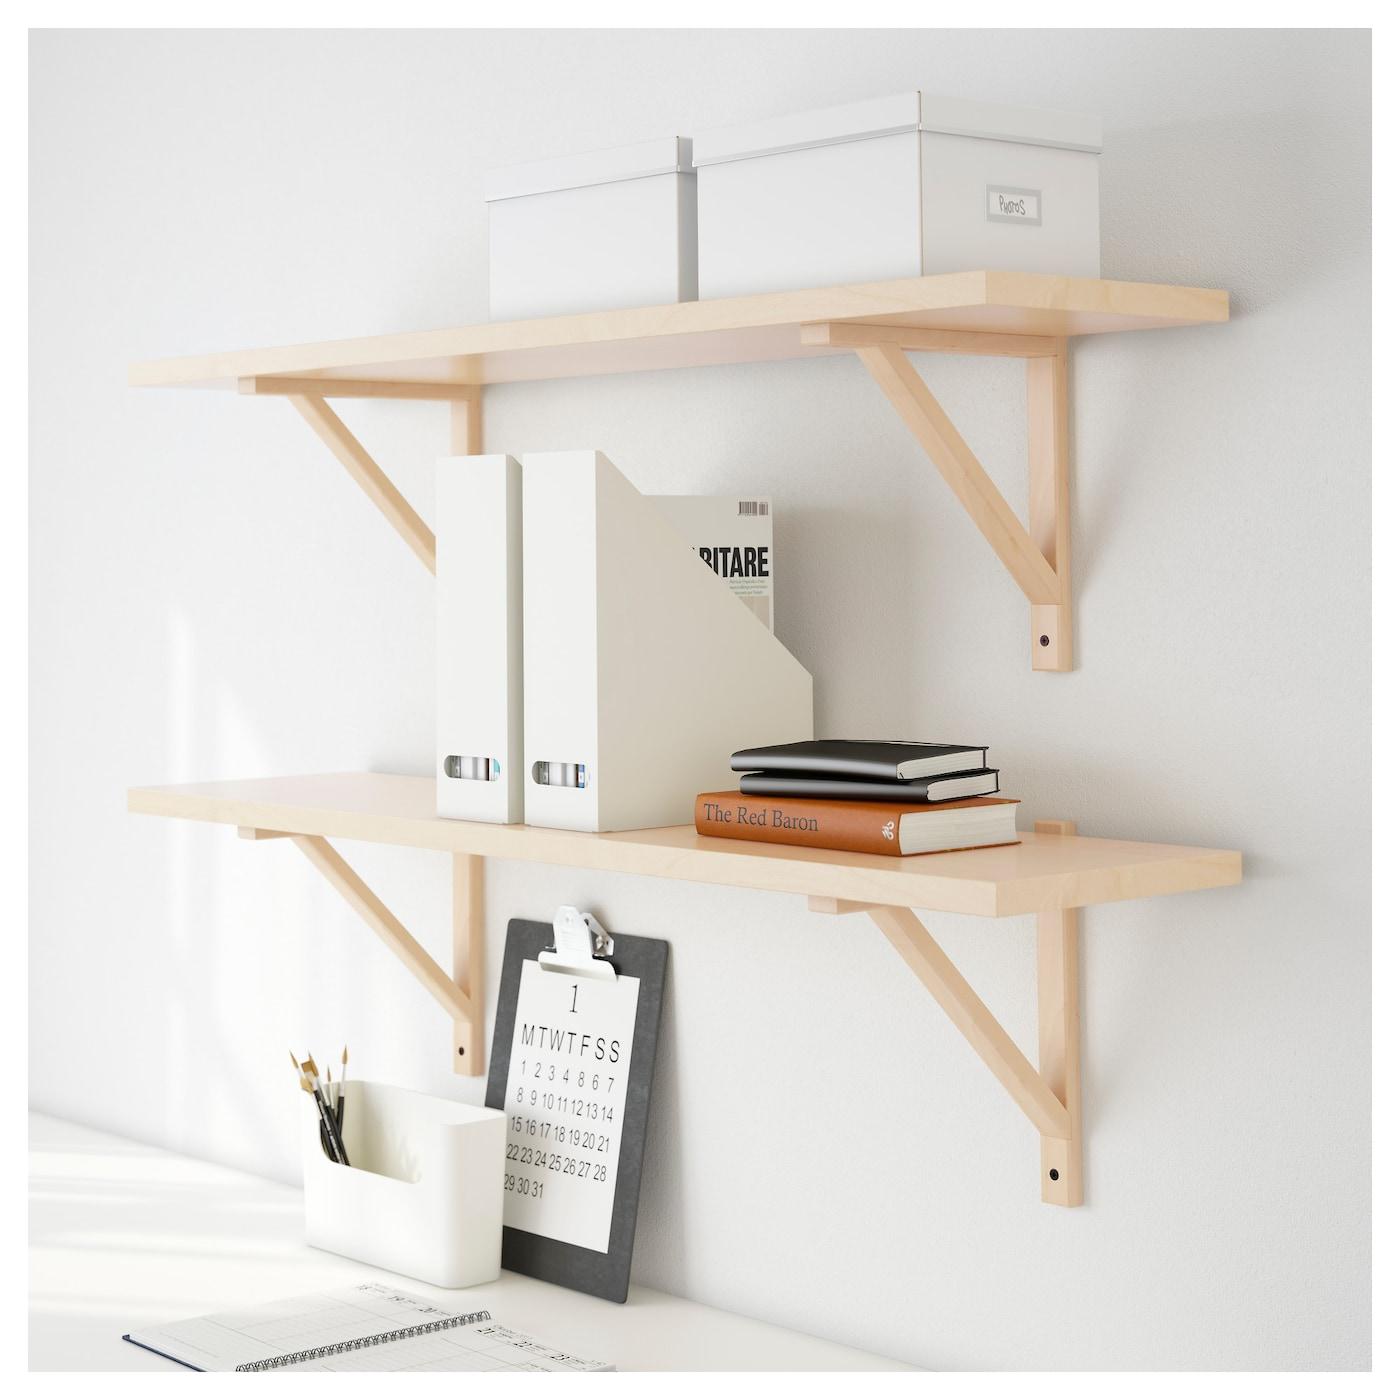 ekby valter ekby j rpen wall shelf birch veneer 119x28 cm ikea. Black Bedroom Furniture Sets. Home Design Ideas